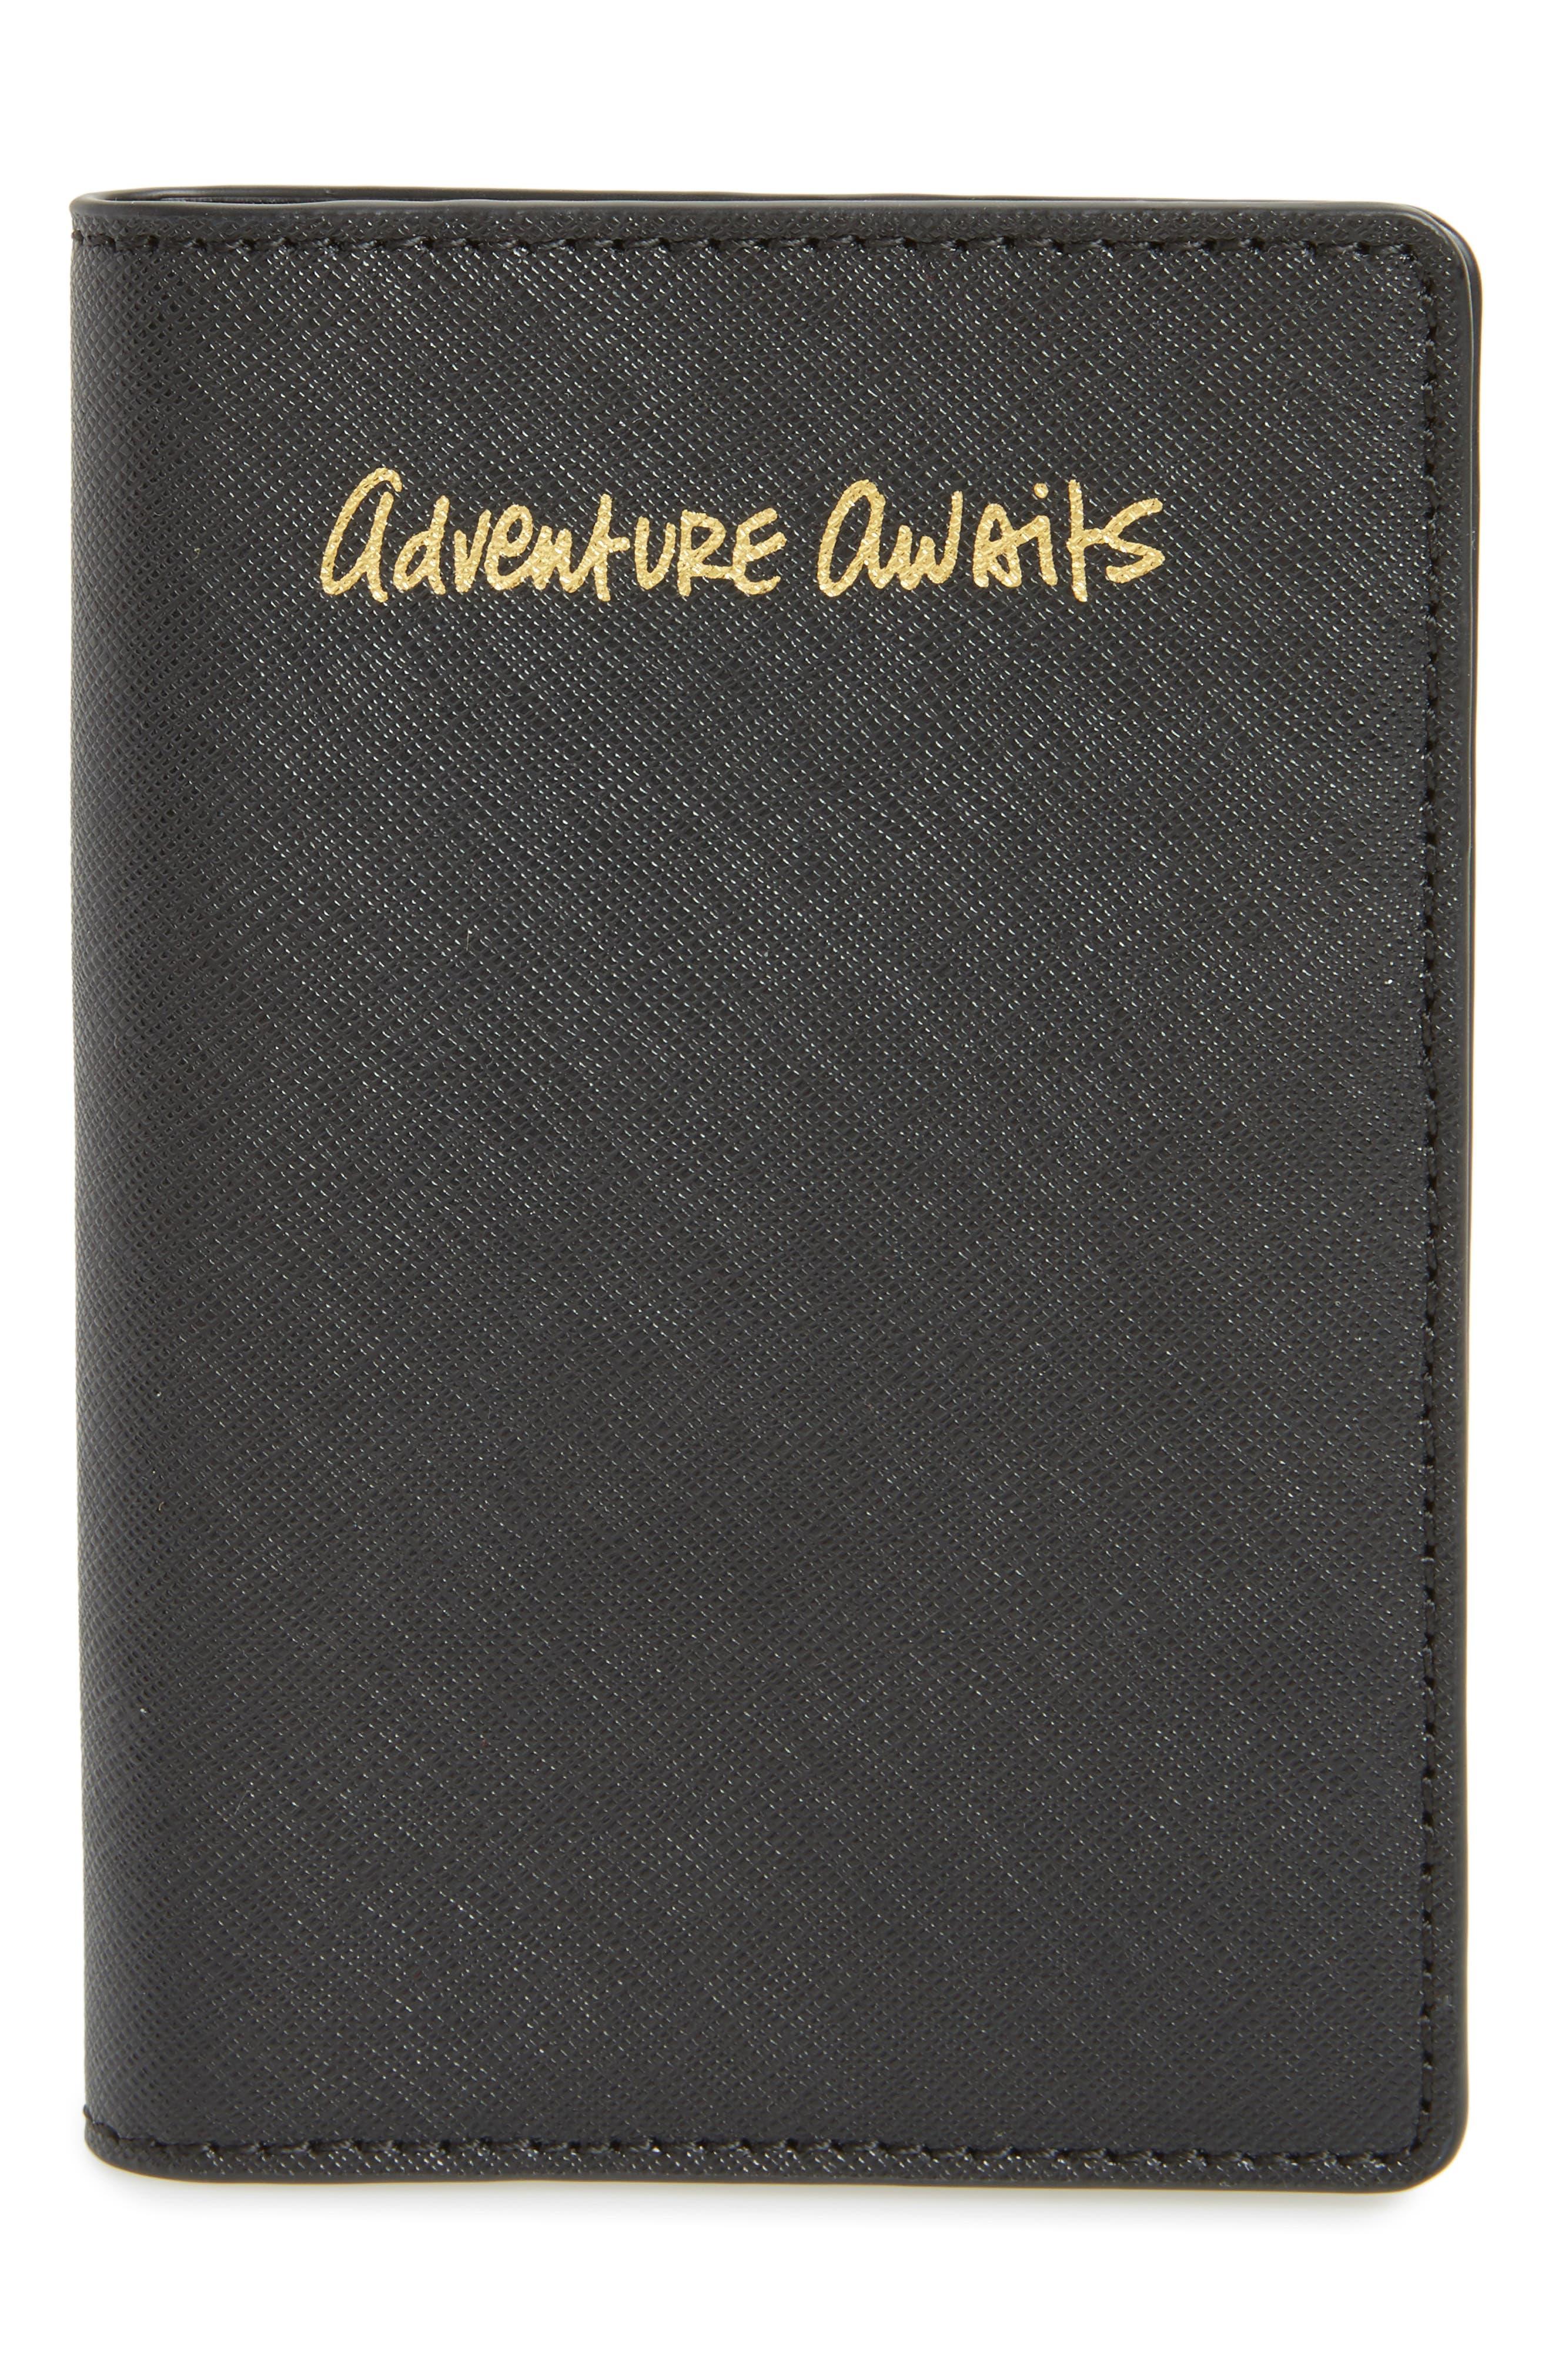 REBECCA MINKOFF, Leather Passport Holder, Main thumbnail 1, color, 001